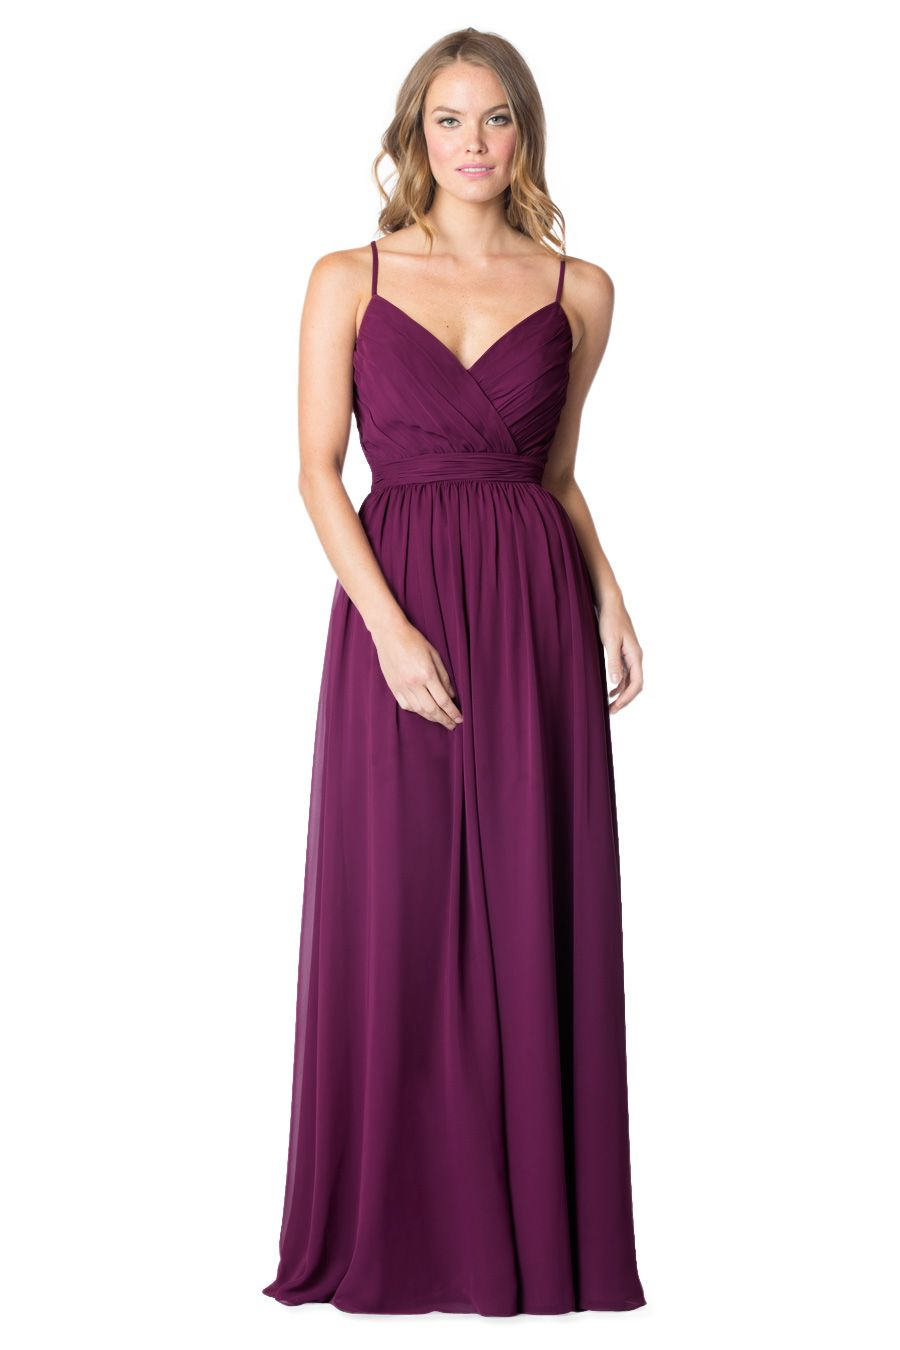 Flannel formal dress  Bari Jay Bridesmaids  Bridesmaid Dresses Prom Dresses u Formal